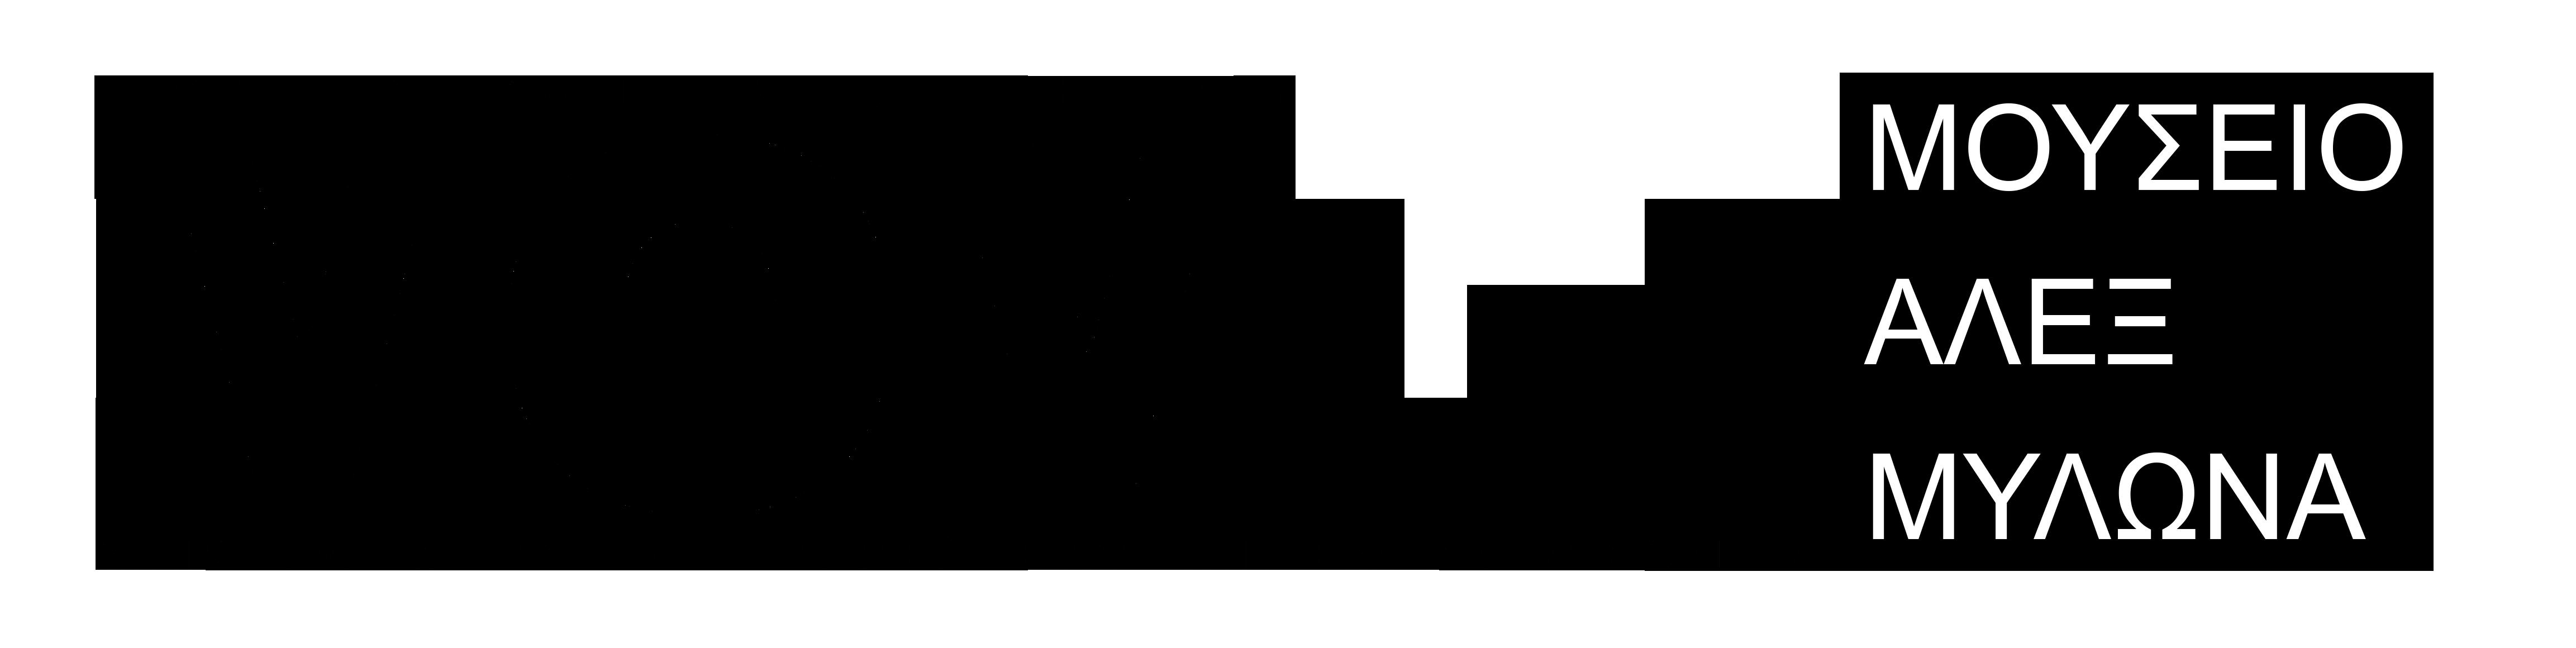 MOMus-Μουσείο Άλεξ Μυλωνά